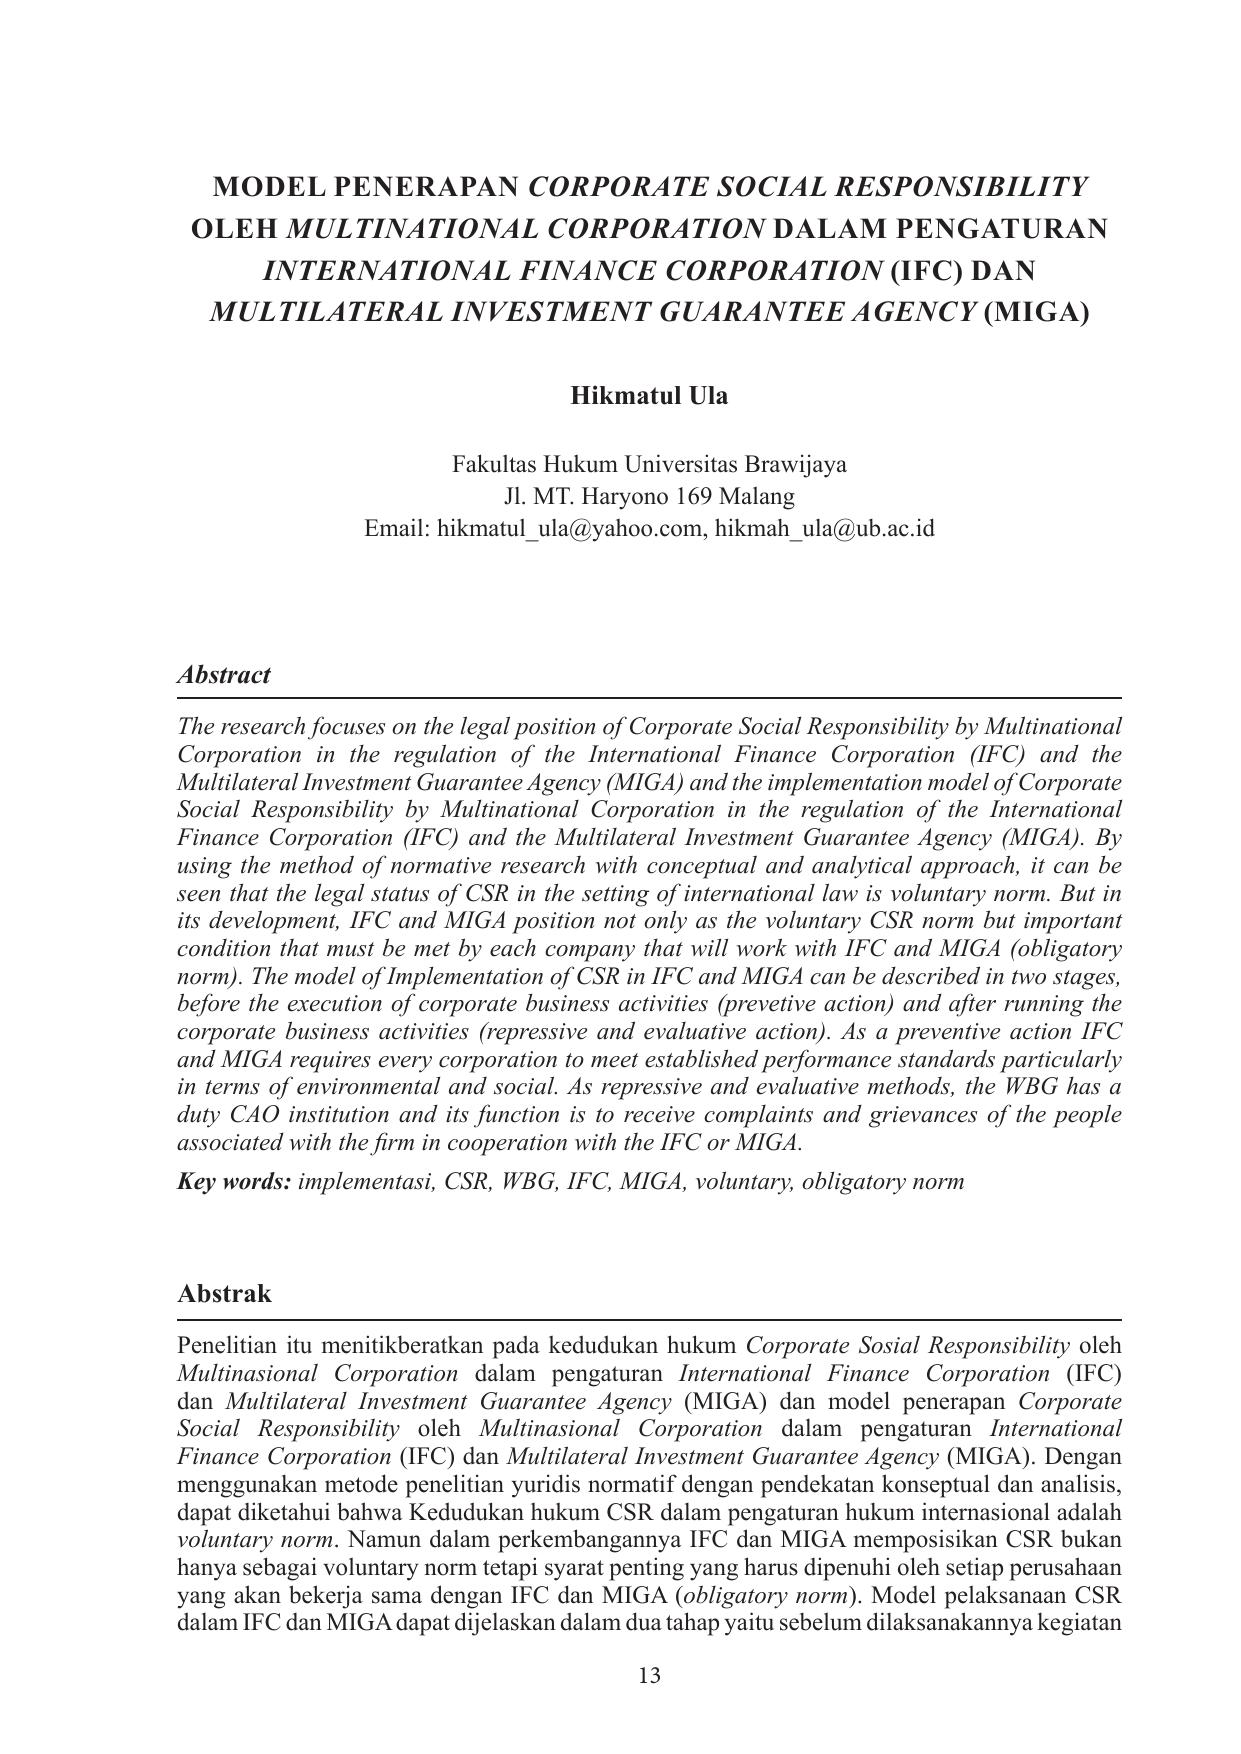 Model Penerapan Corporate Social Responsibility Oleh